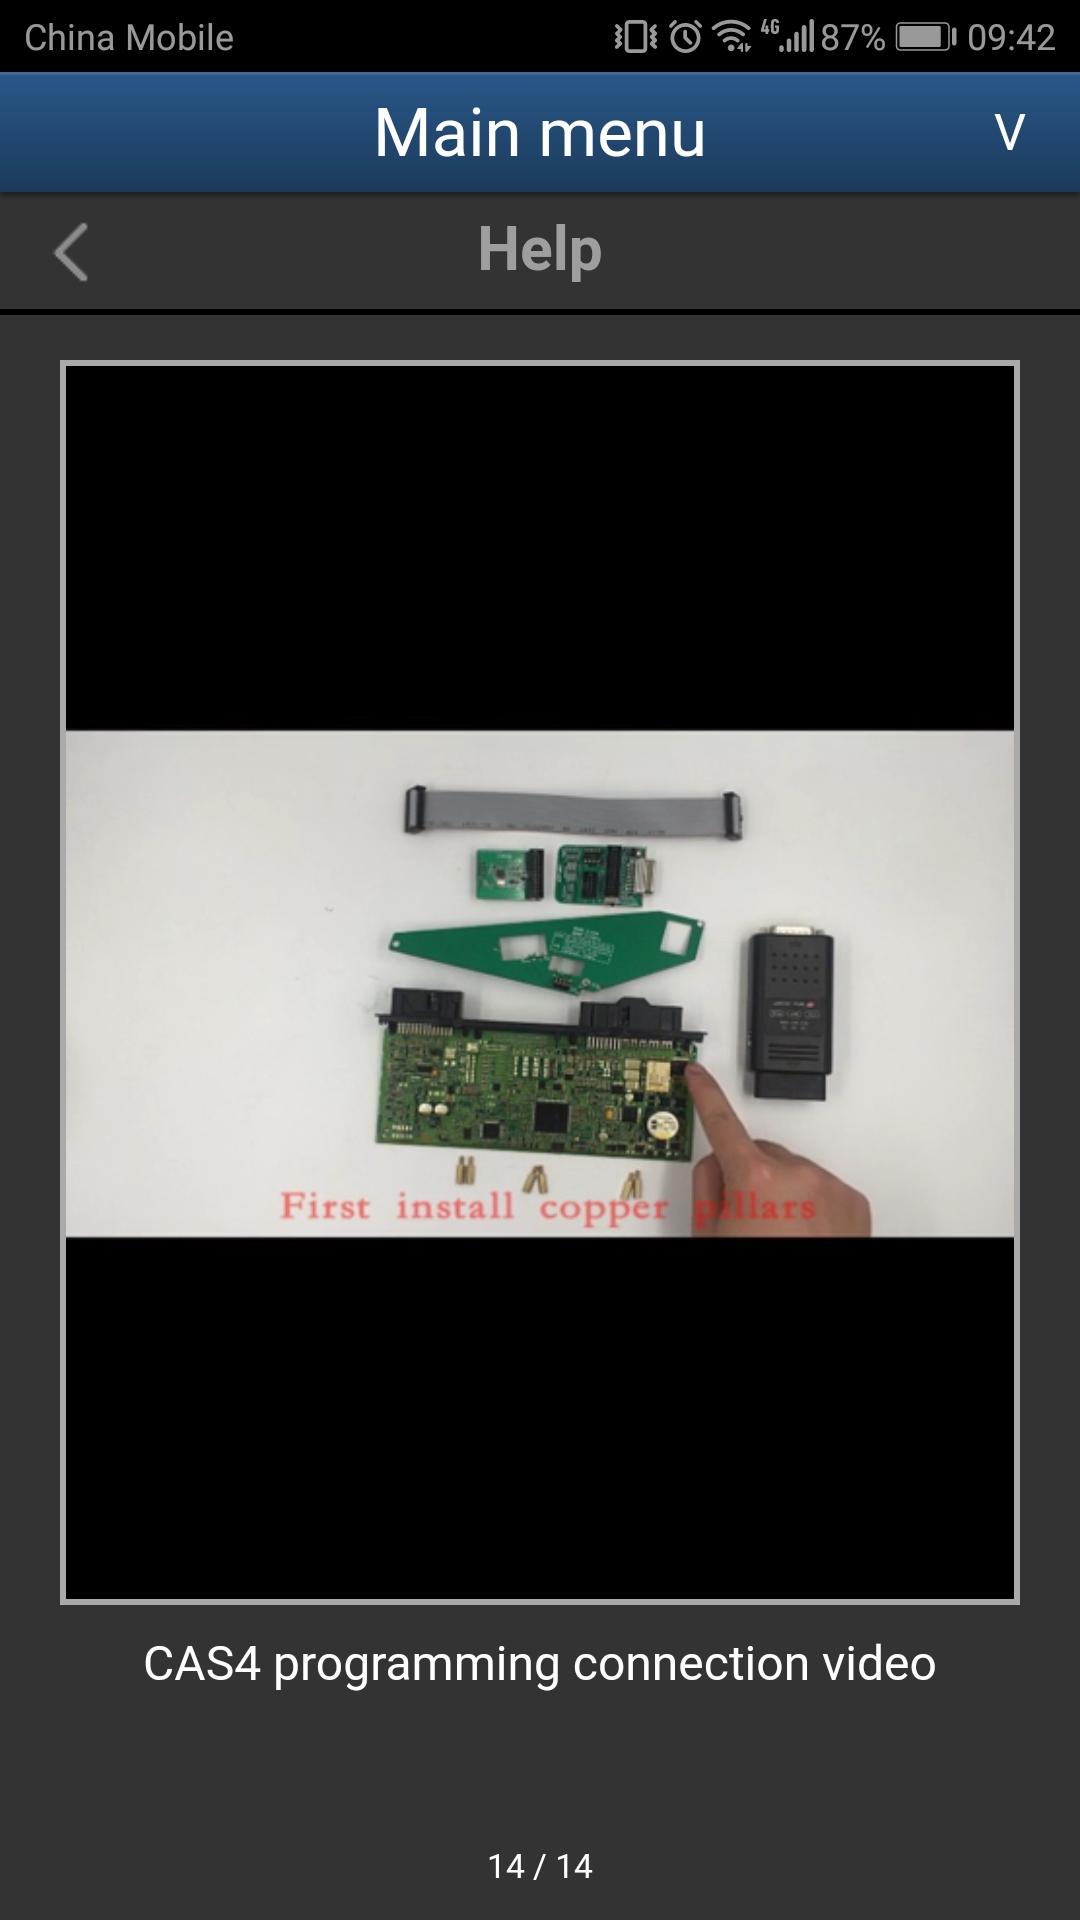 acdp-mini-bmw-cas4-newest-wiring-diagram-04